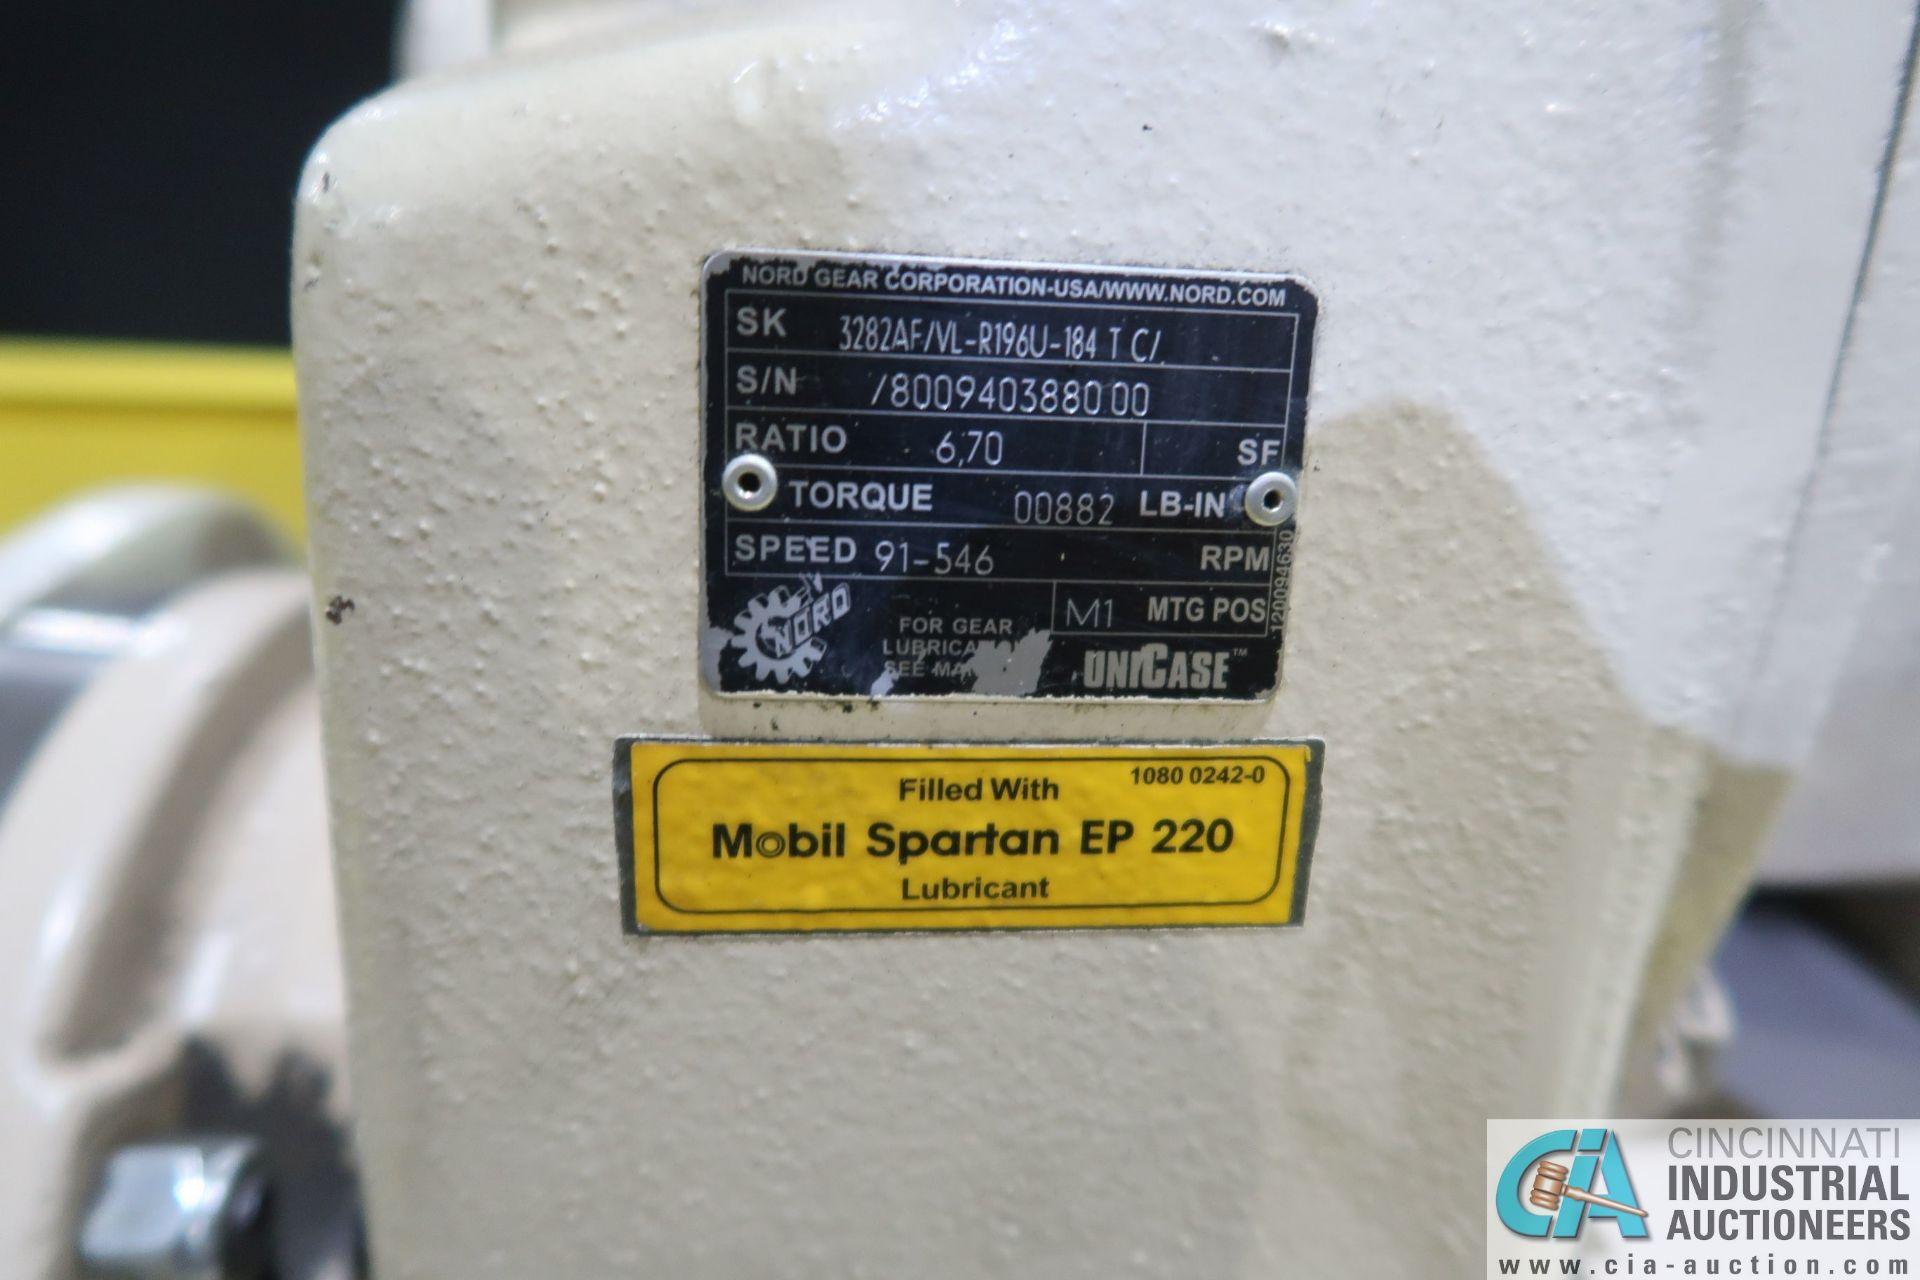 OHIO TOOL MODEL OTW-1000-5-2M PROGRAMMABLE HORIZONTAL HONE; S/N 22945, 6.5' STROKE, 5 HP DRIVE ( - Image 11 of 20